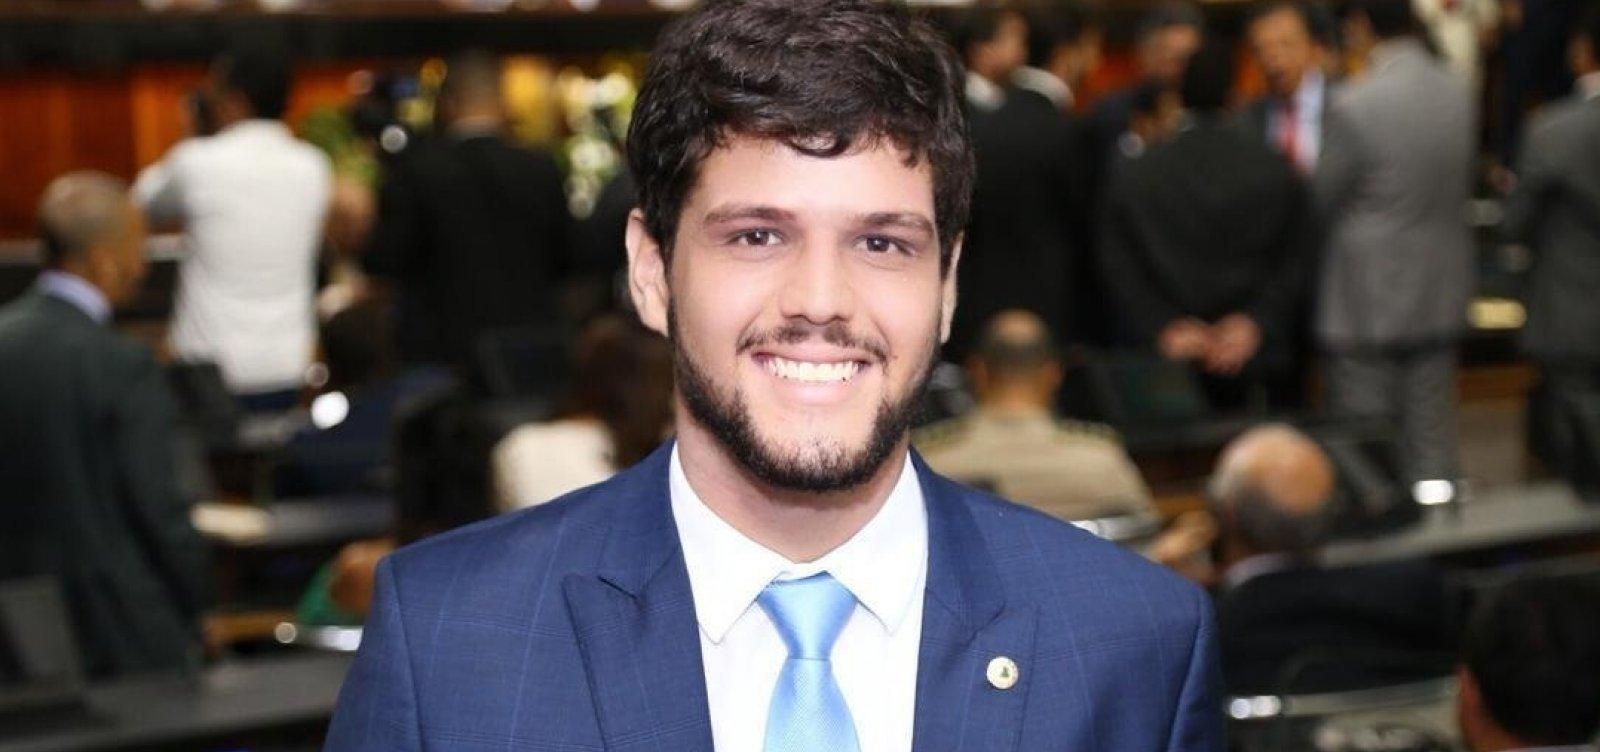 Santo Antônio de Jesus: Deputado Estadual 'Rogerinho' será investigado por crime eleitoral